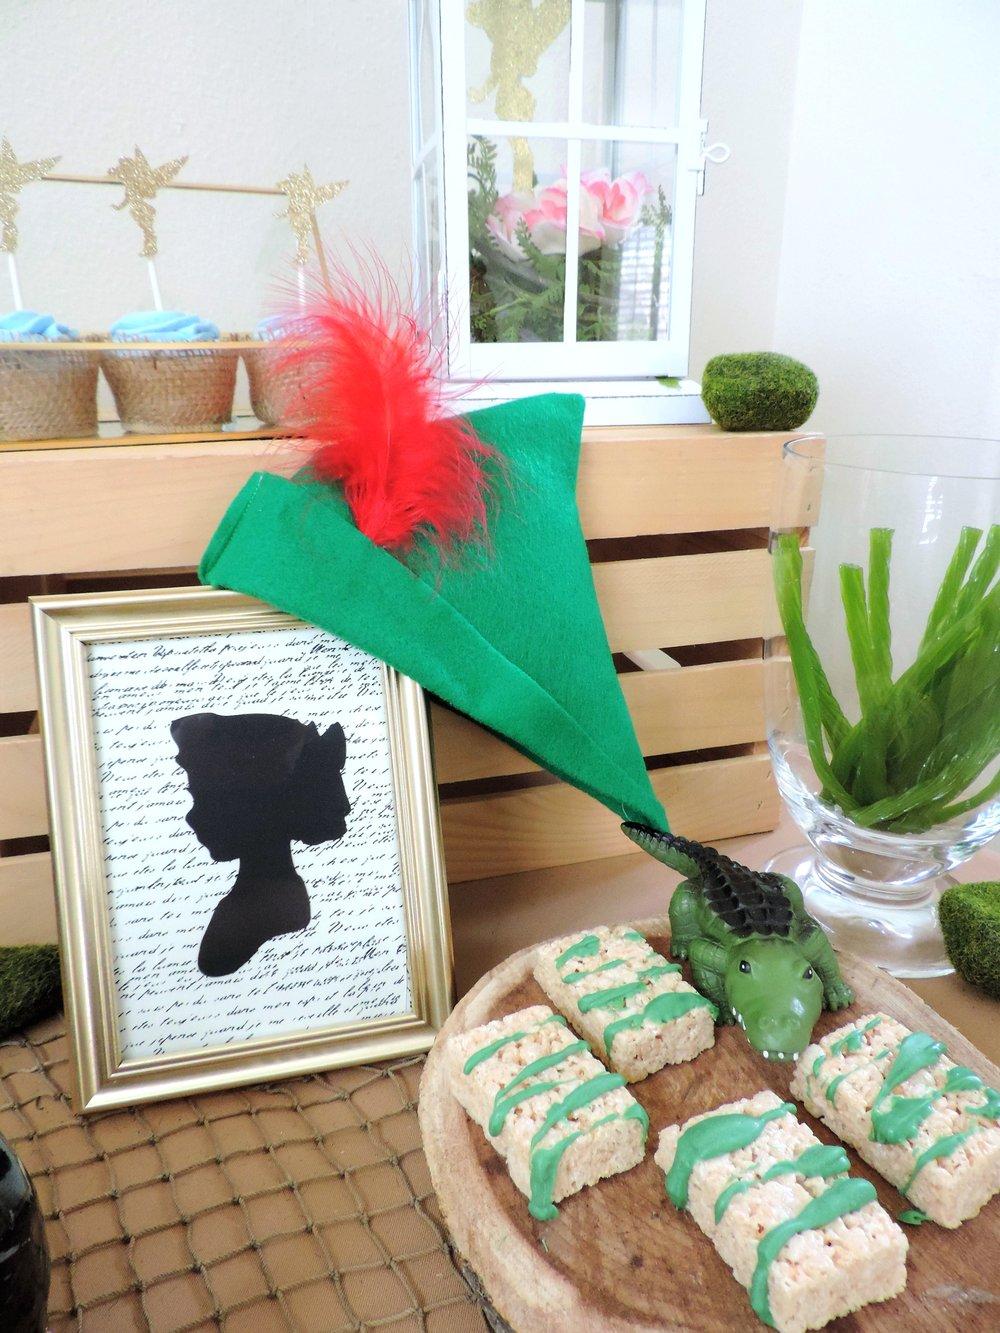 Peter Pan and Wendy-Peter Pan Party-Tinkerbell-Peter Pan Party Decor-peter pan party ideas-peter pan birthday-peter pan birthday decor-www.SugarPartiesLA.com.jpg